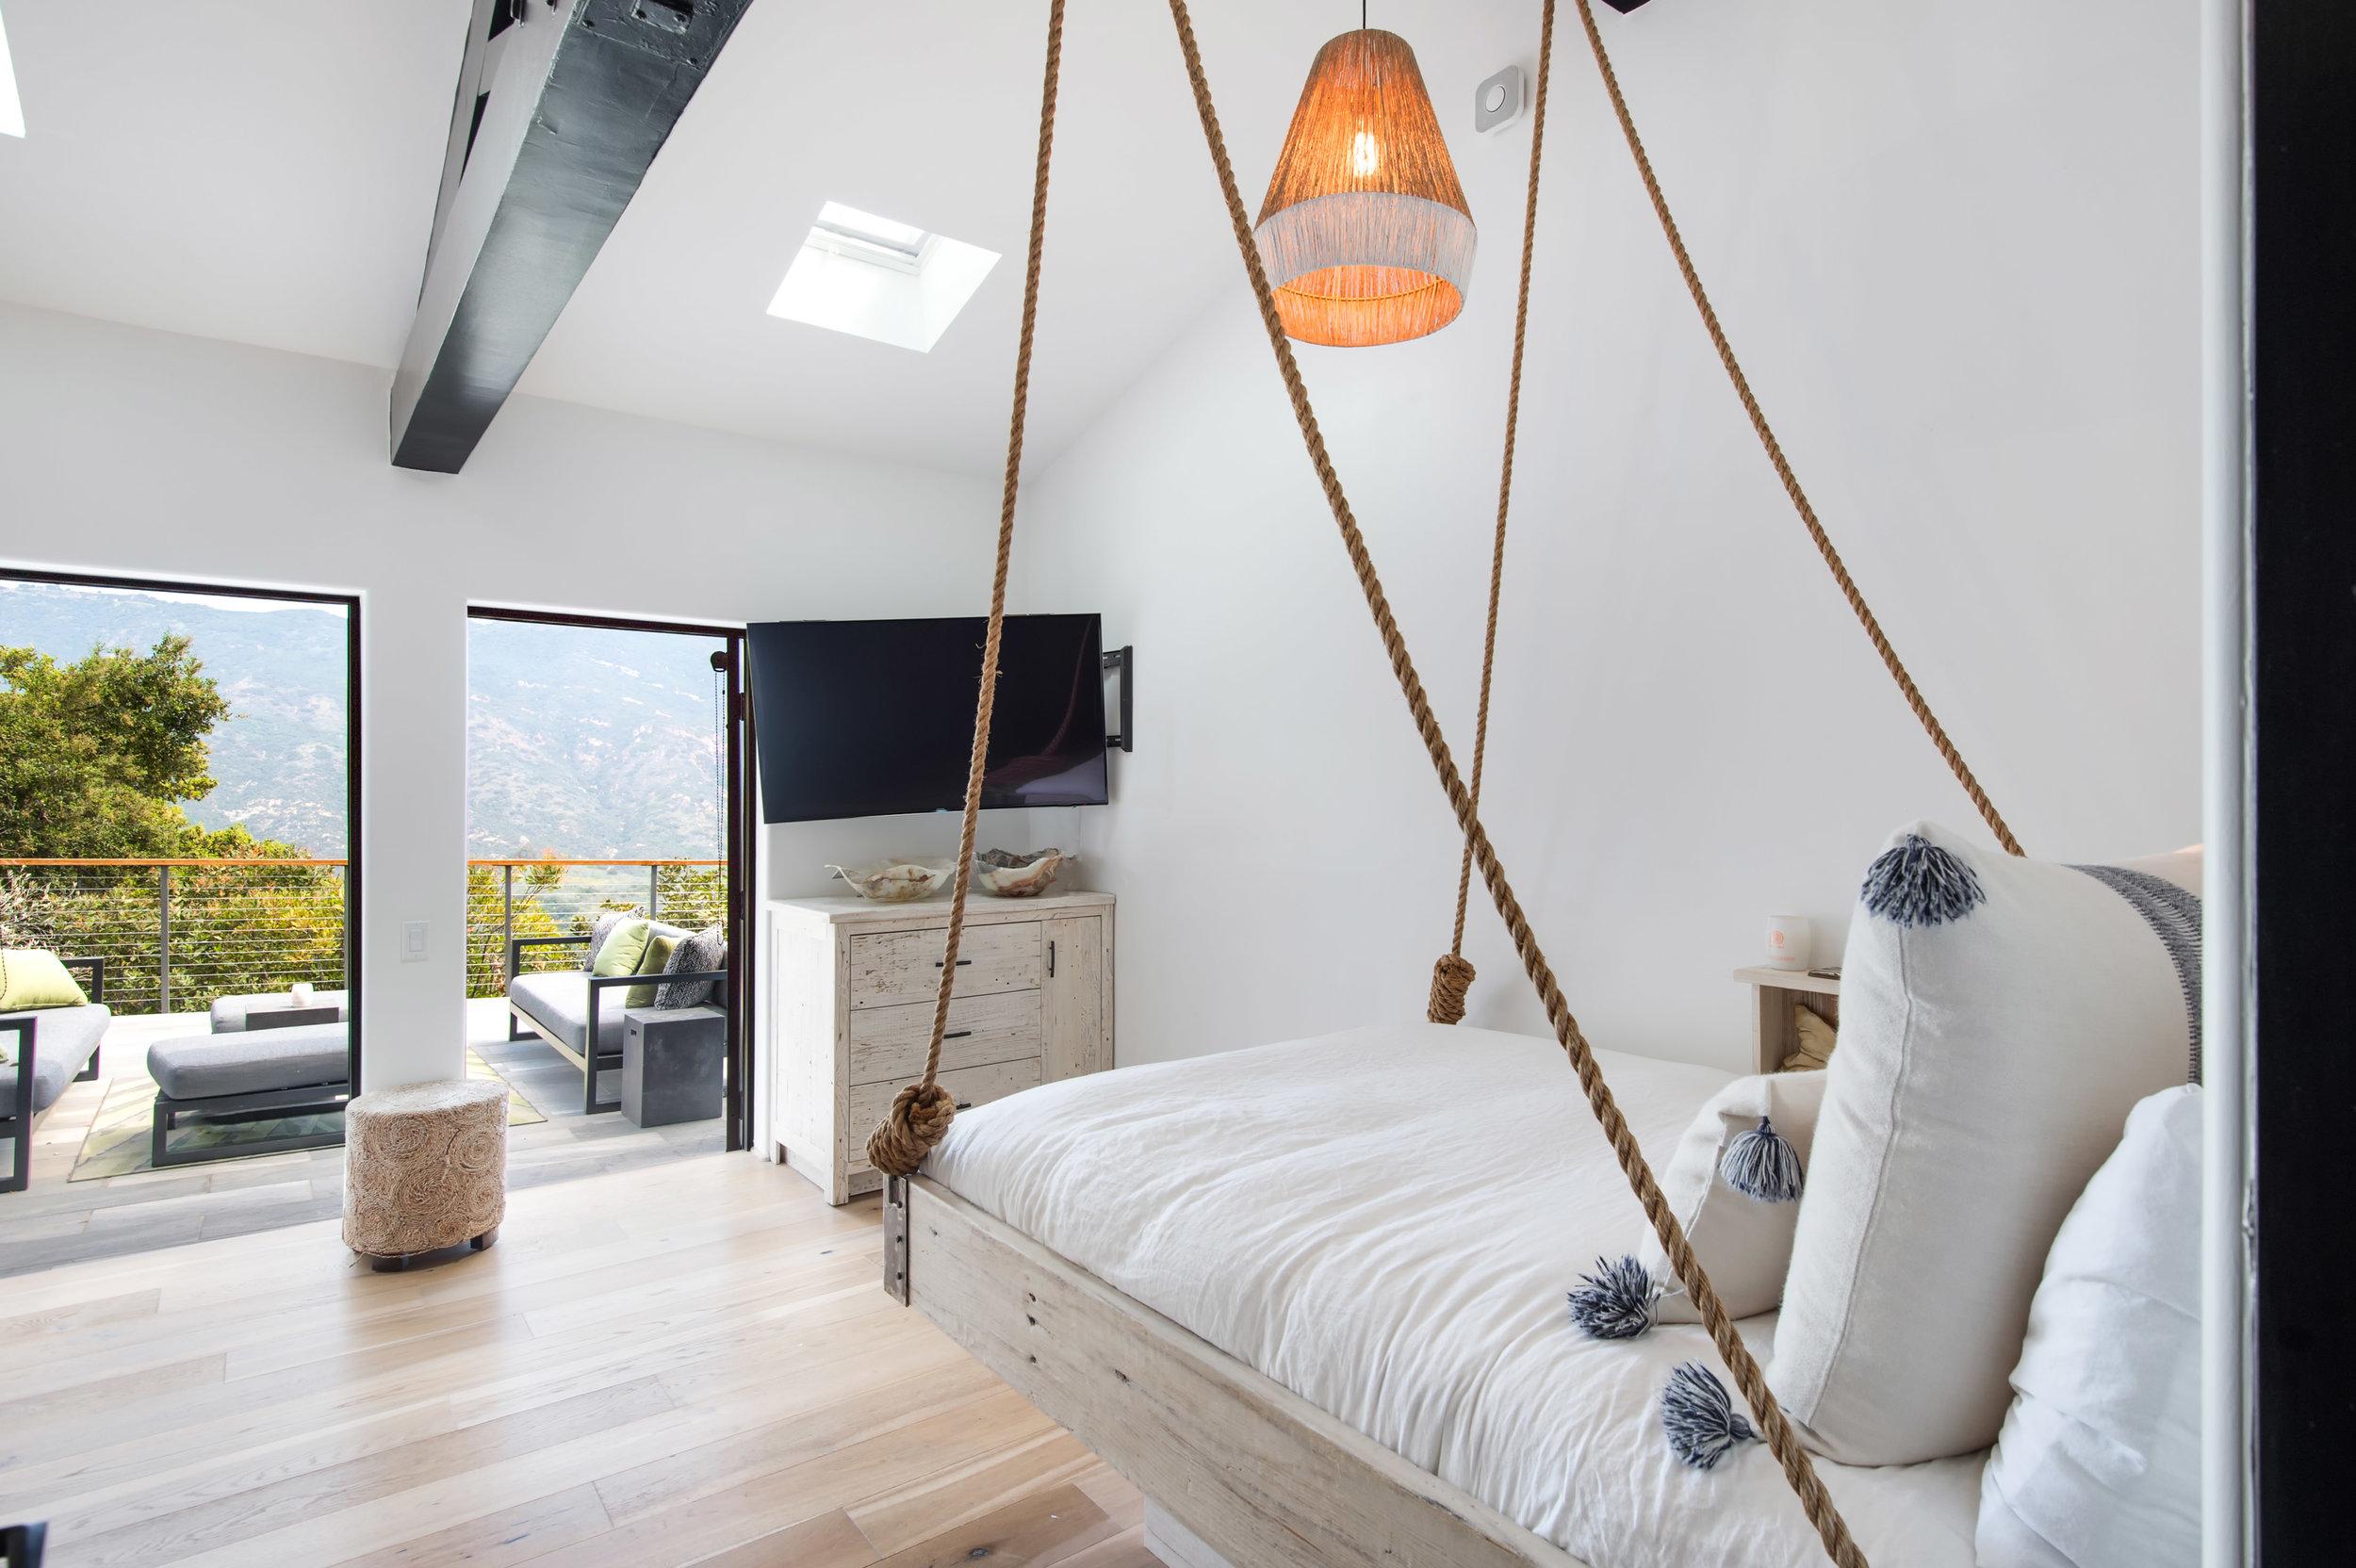 024 Bedroom 26272 Cool Glen Way Malibu For Sale Luxury Real Estate.jpg